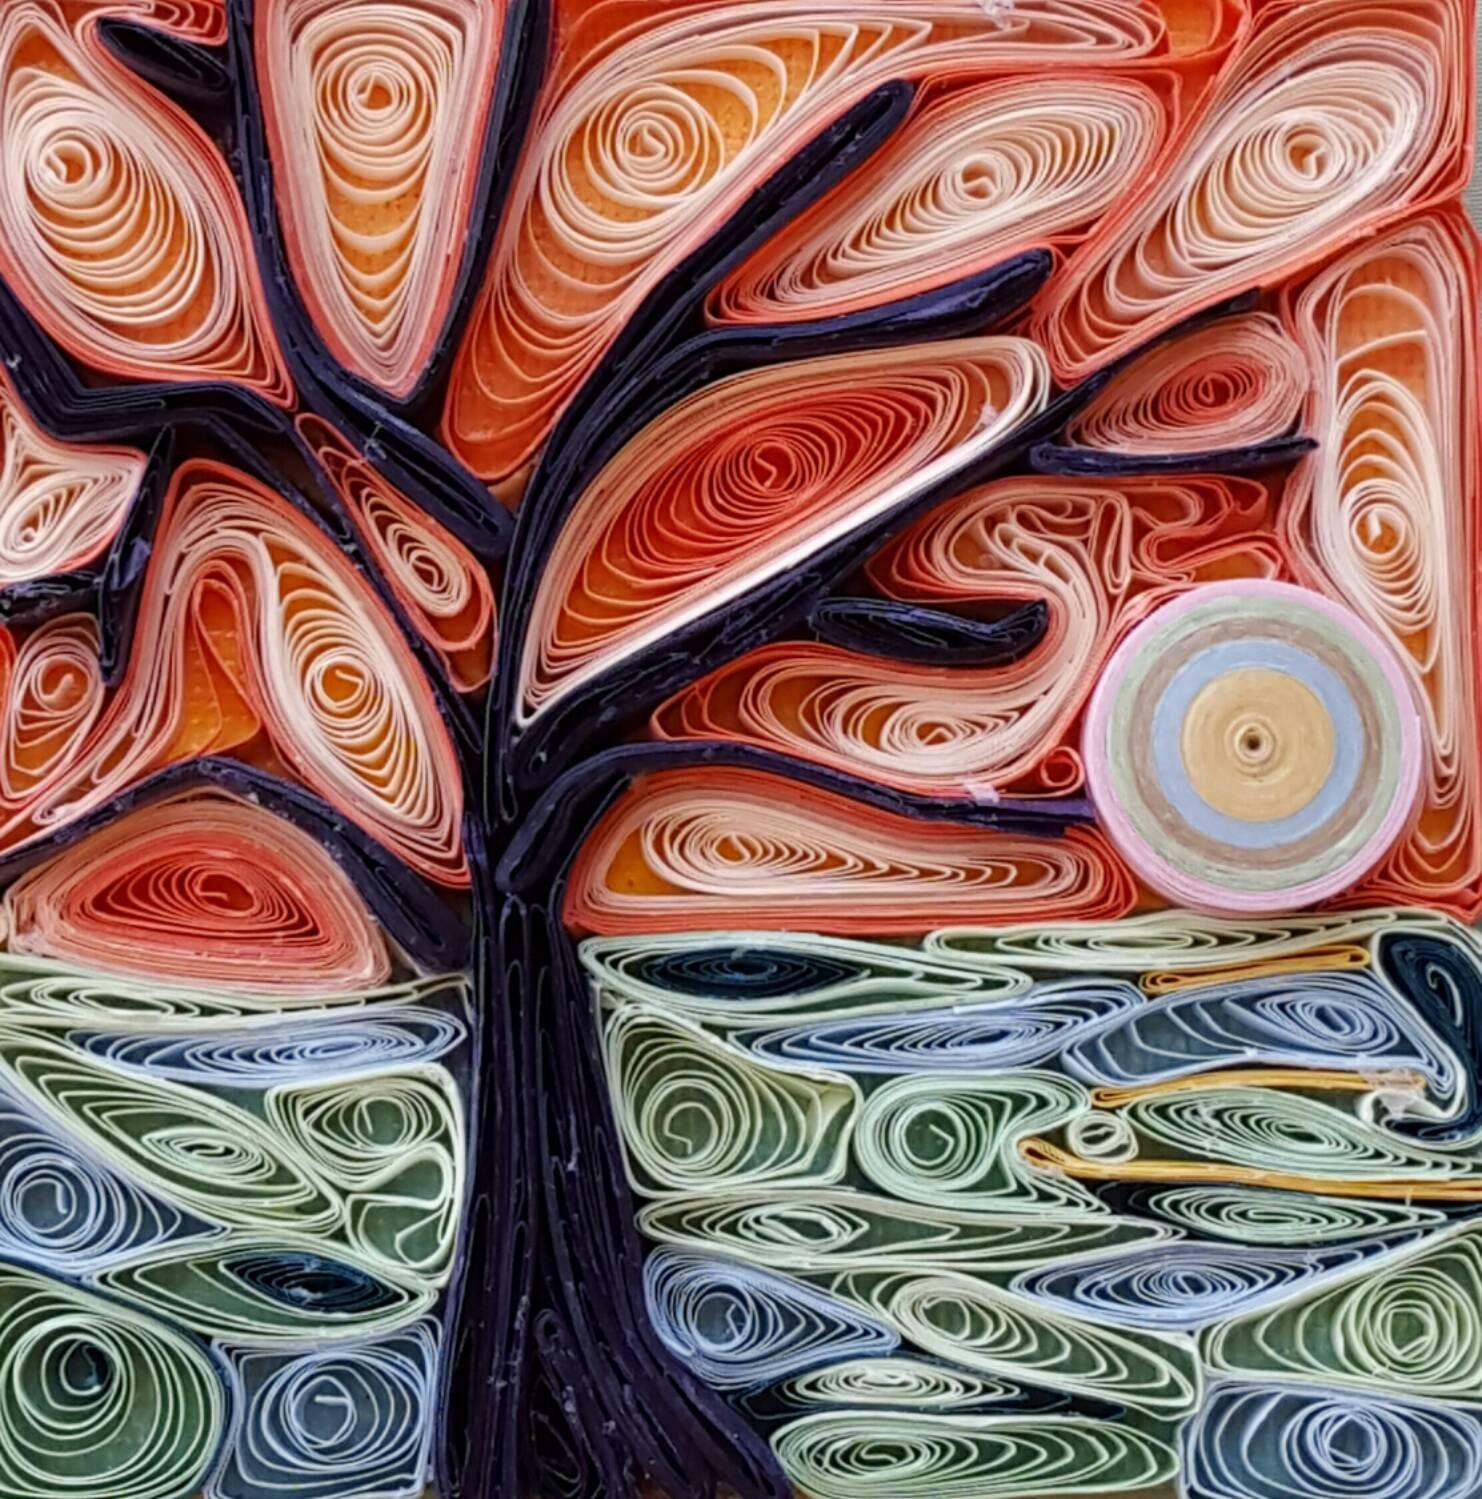 Abstract Mosaic Art Patterns